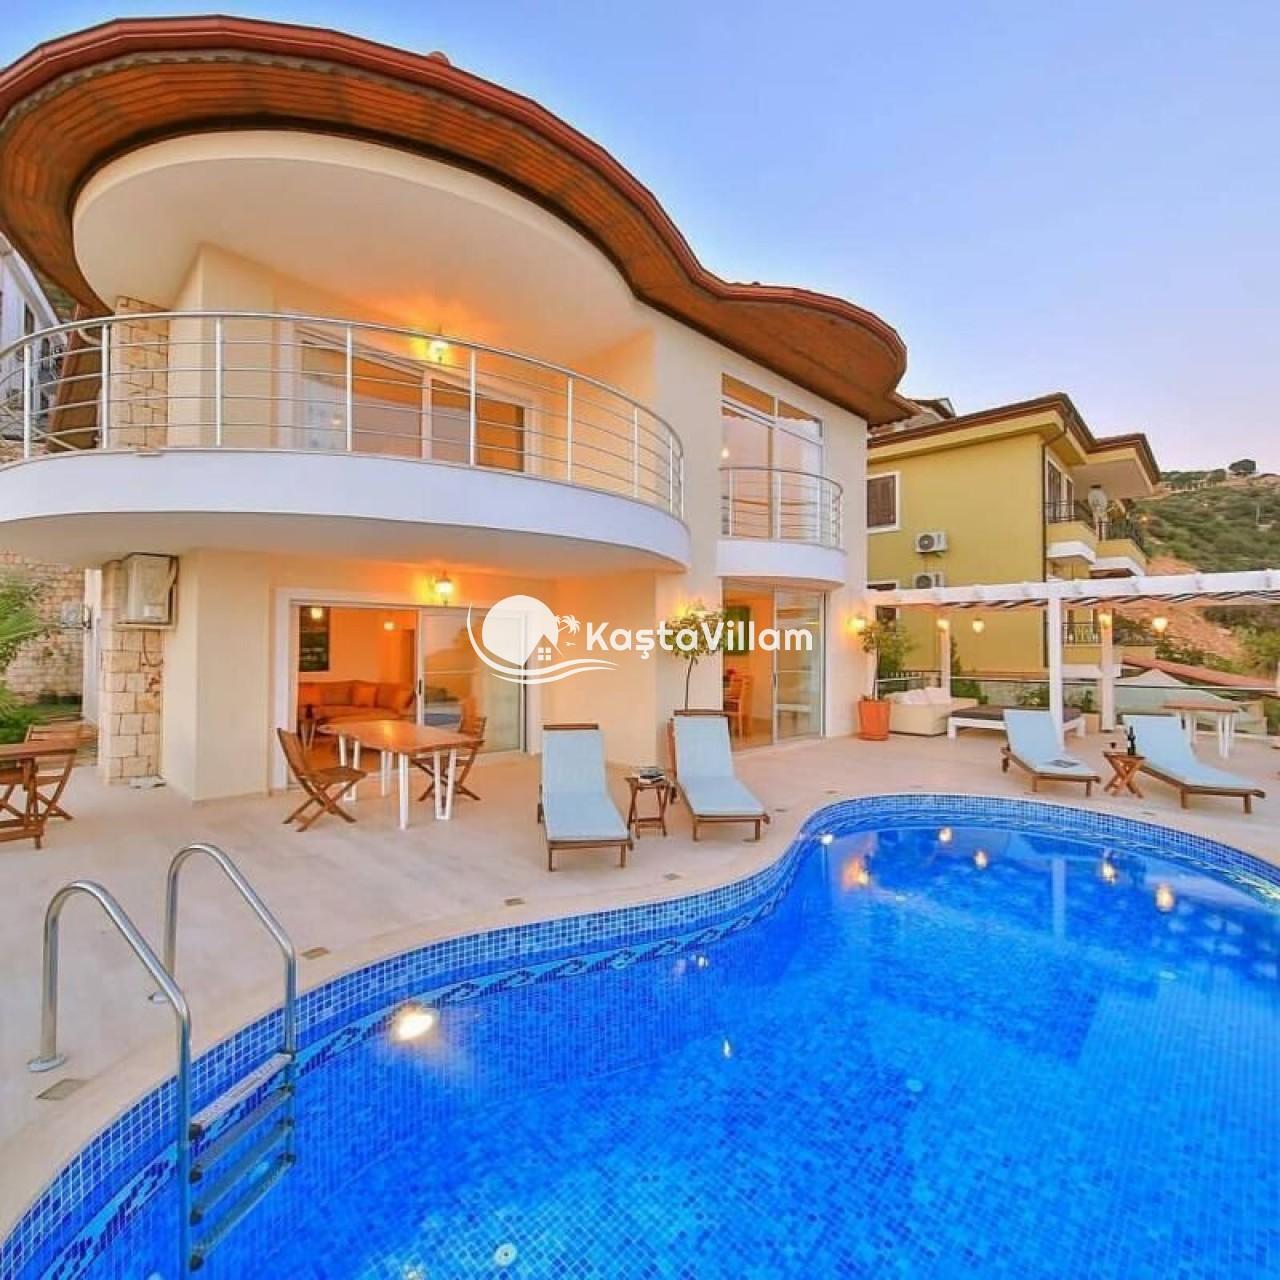 VİLLA LADY | Kaş Kiralık Villa, Kaş Yazlık Villa - Kaştavillam